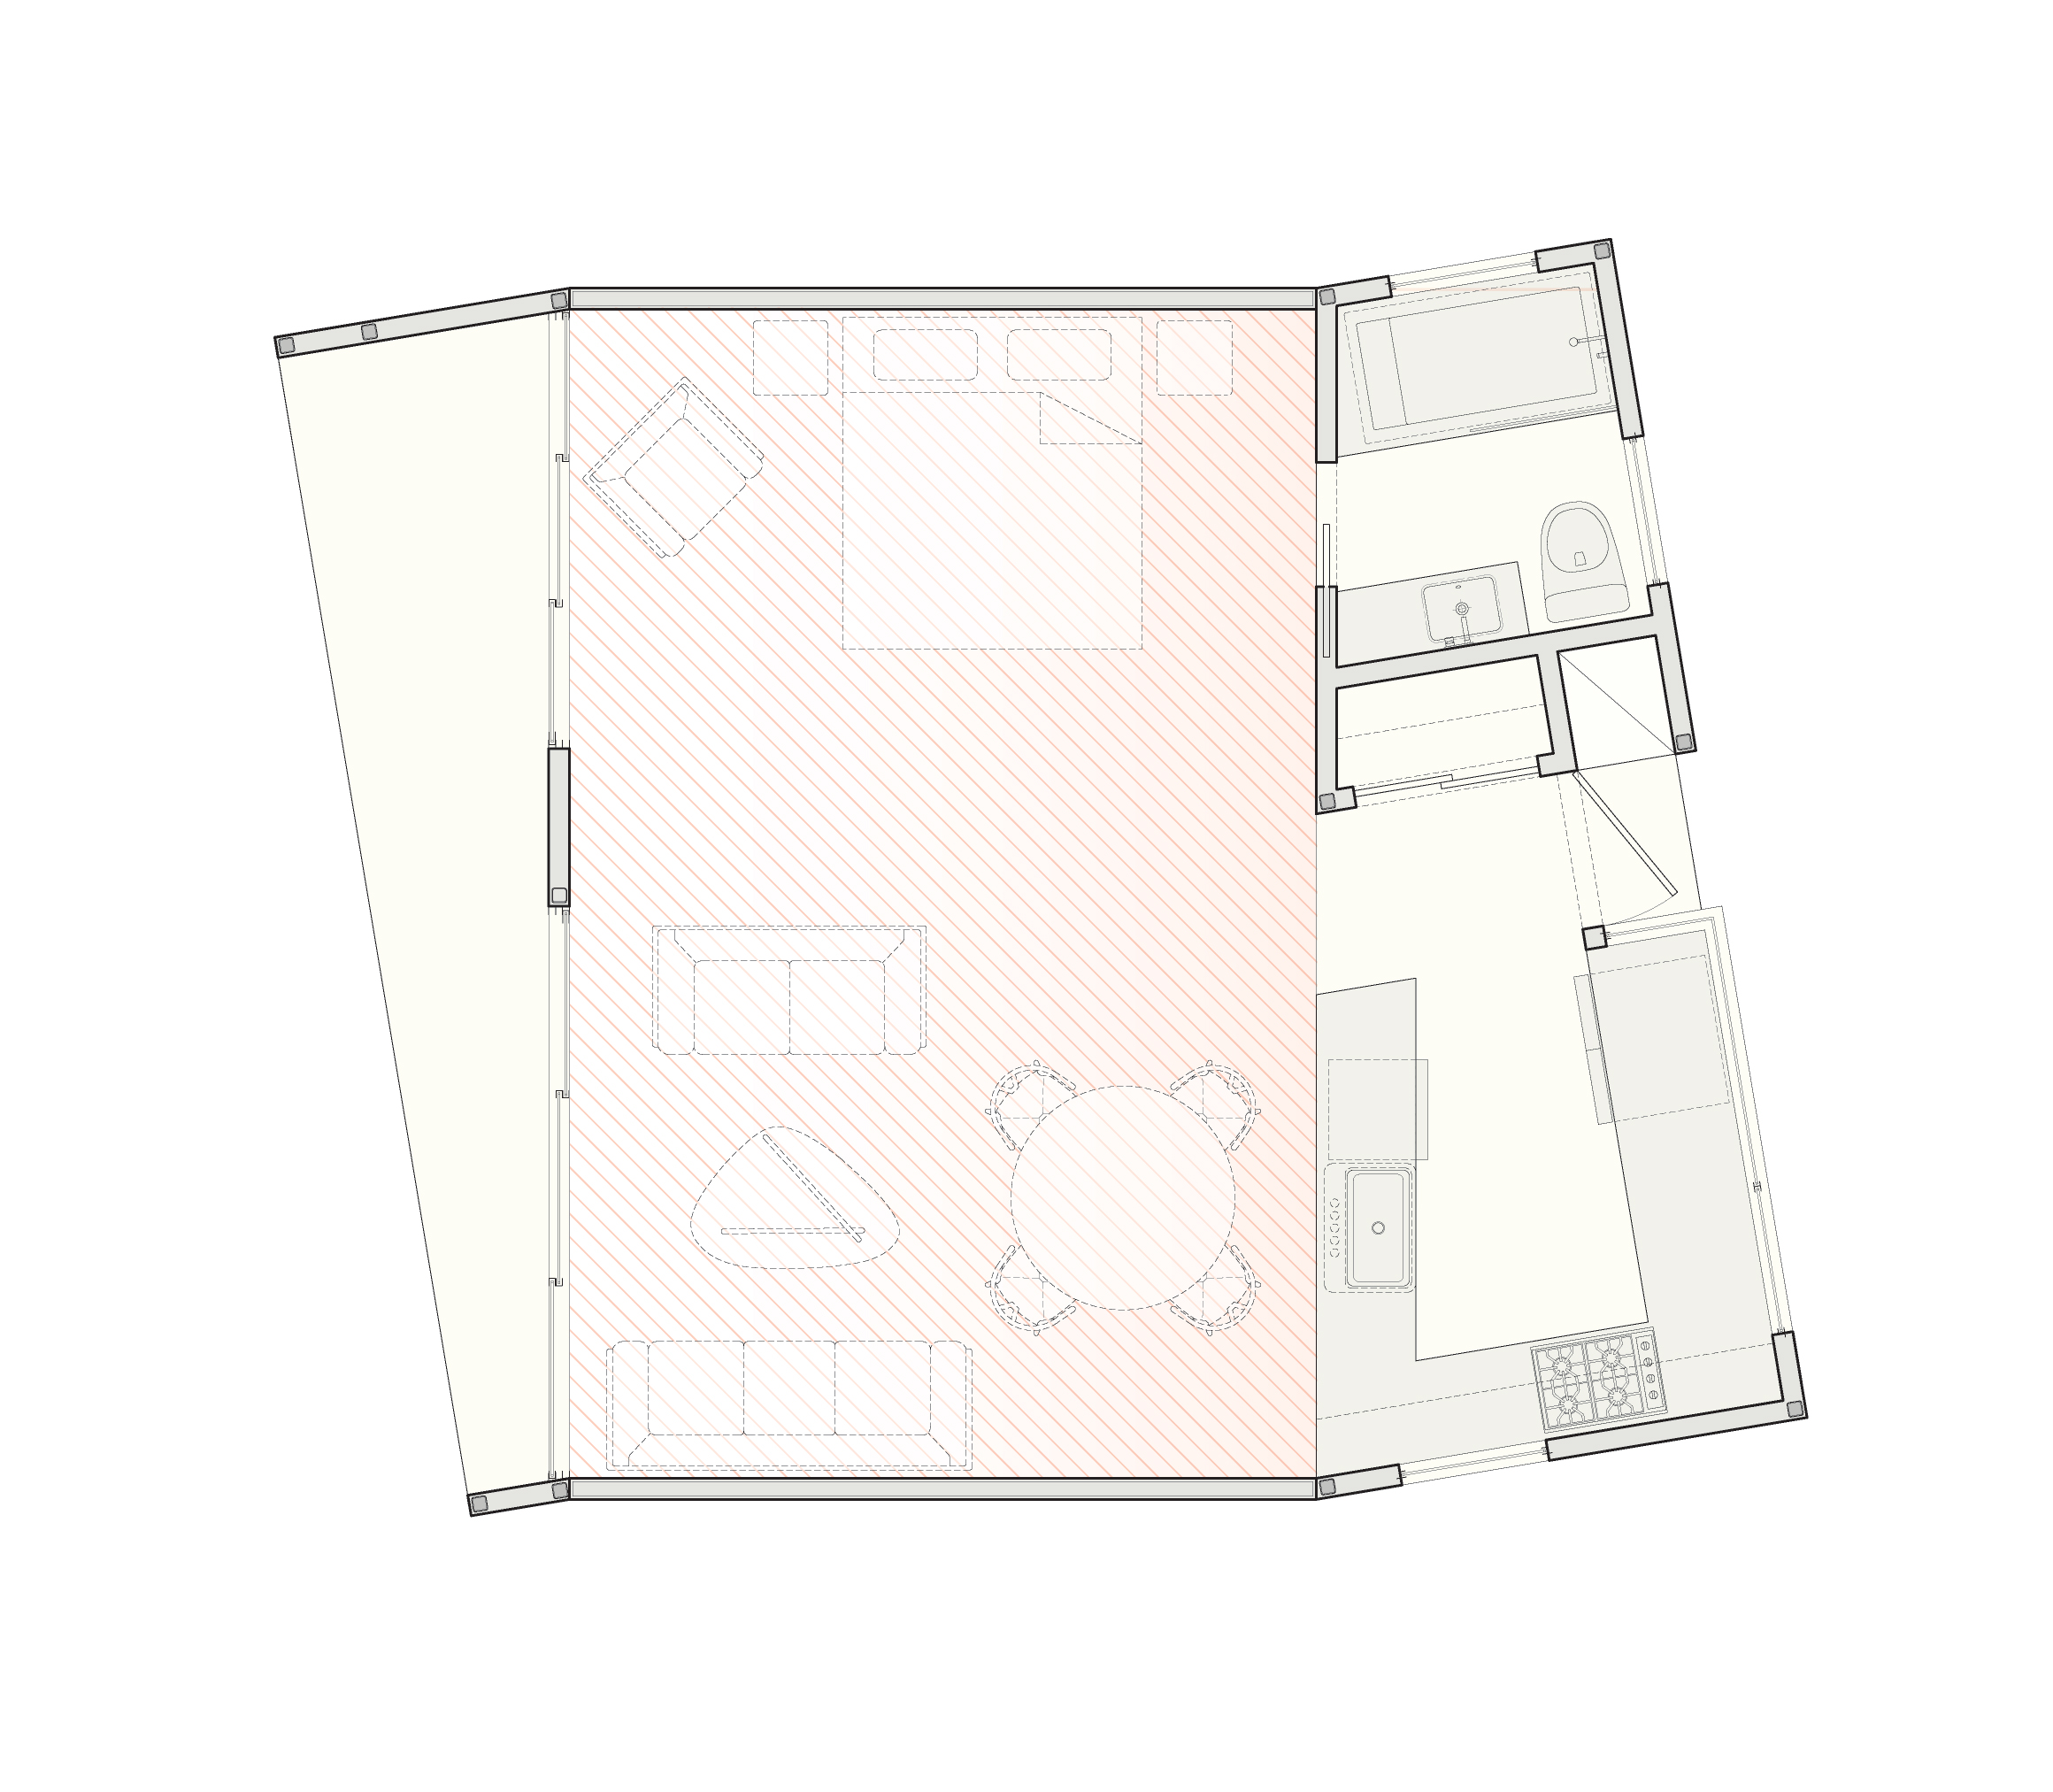 The ground-floor plan of the single-story, studio scheme.